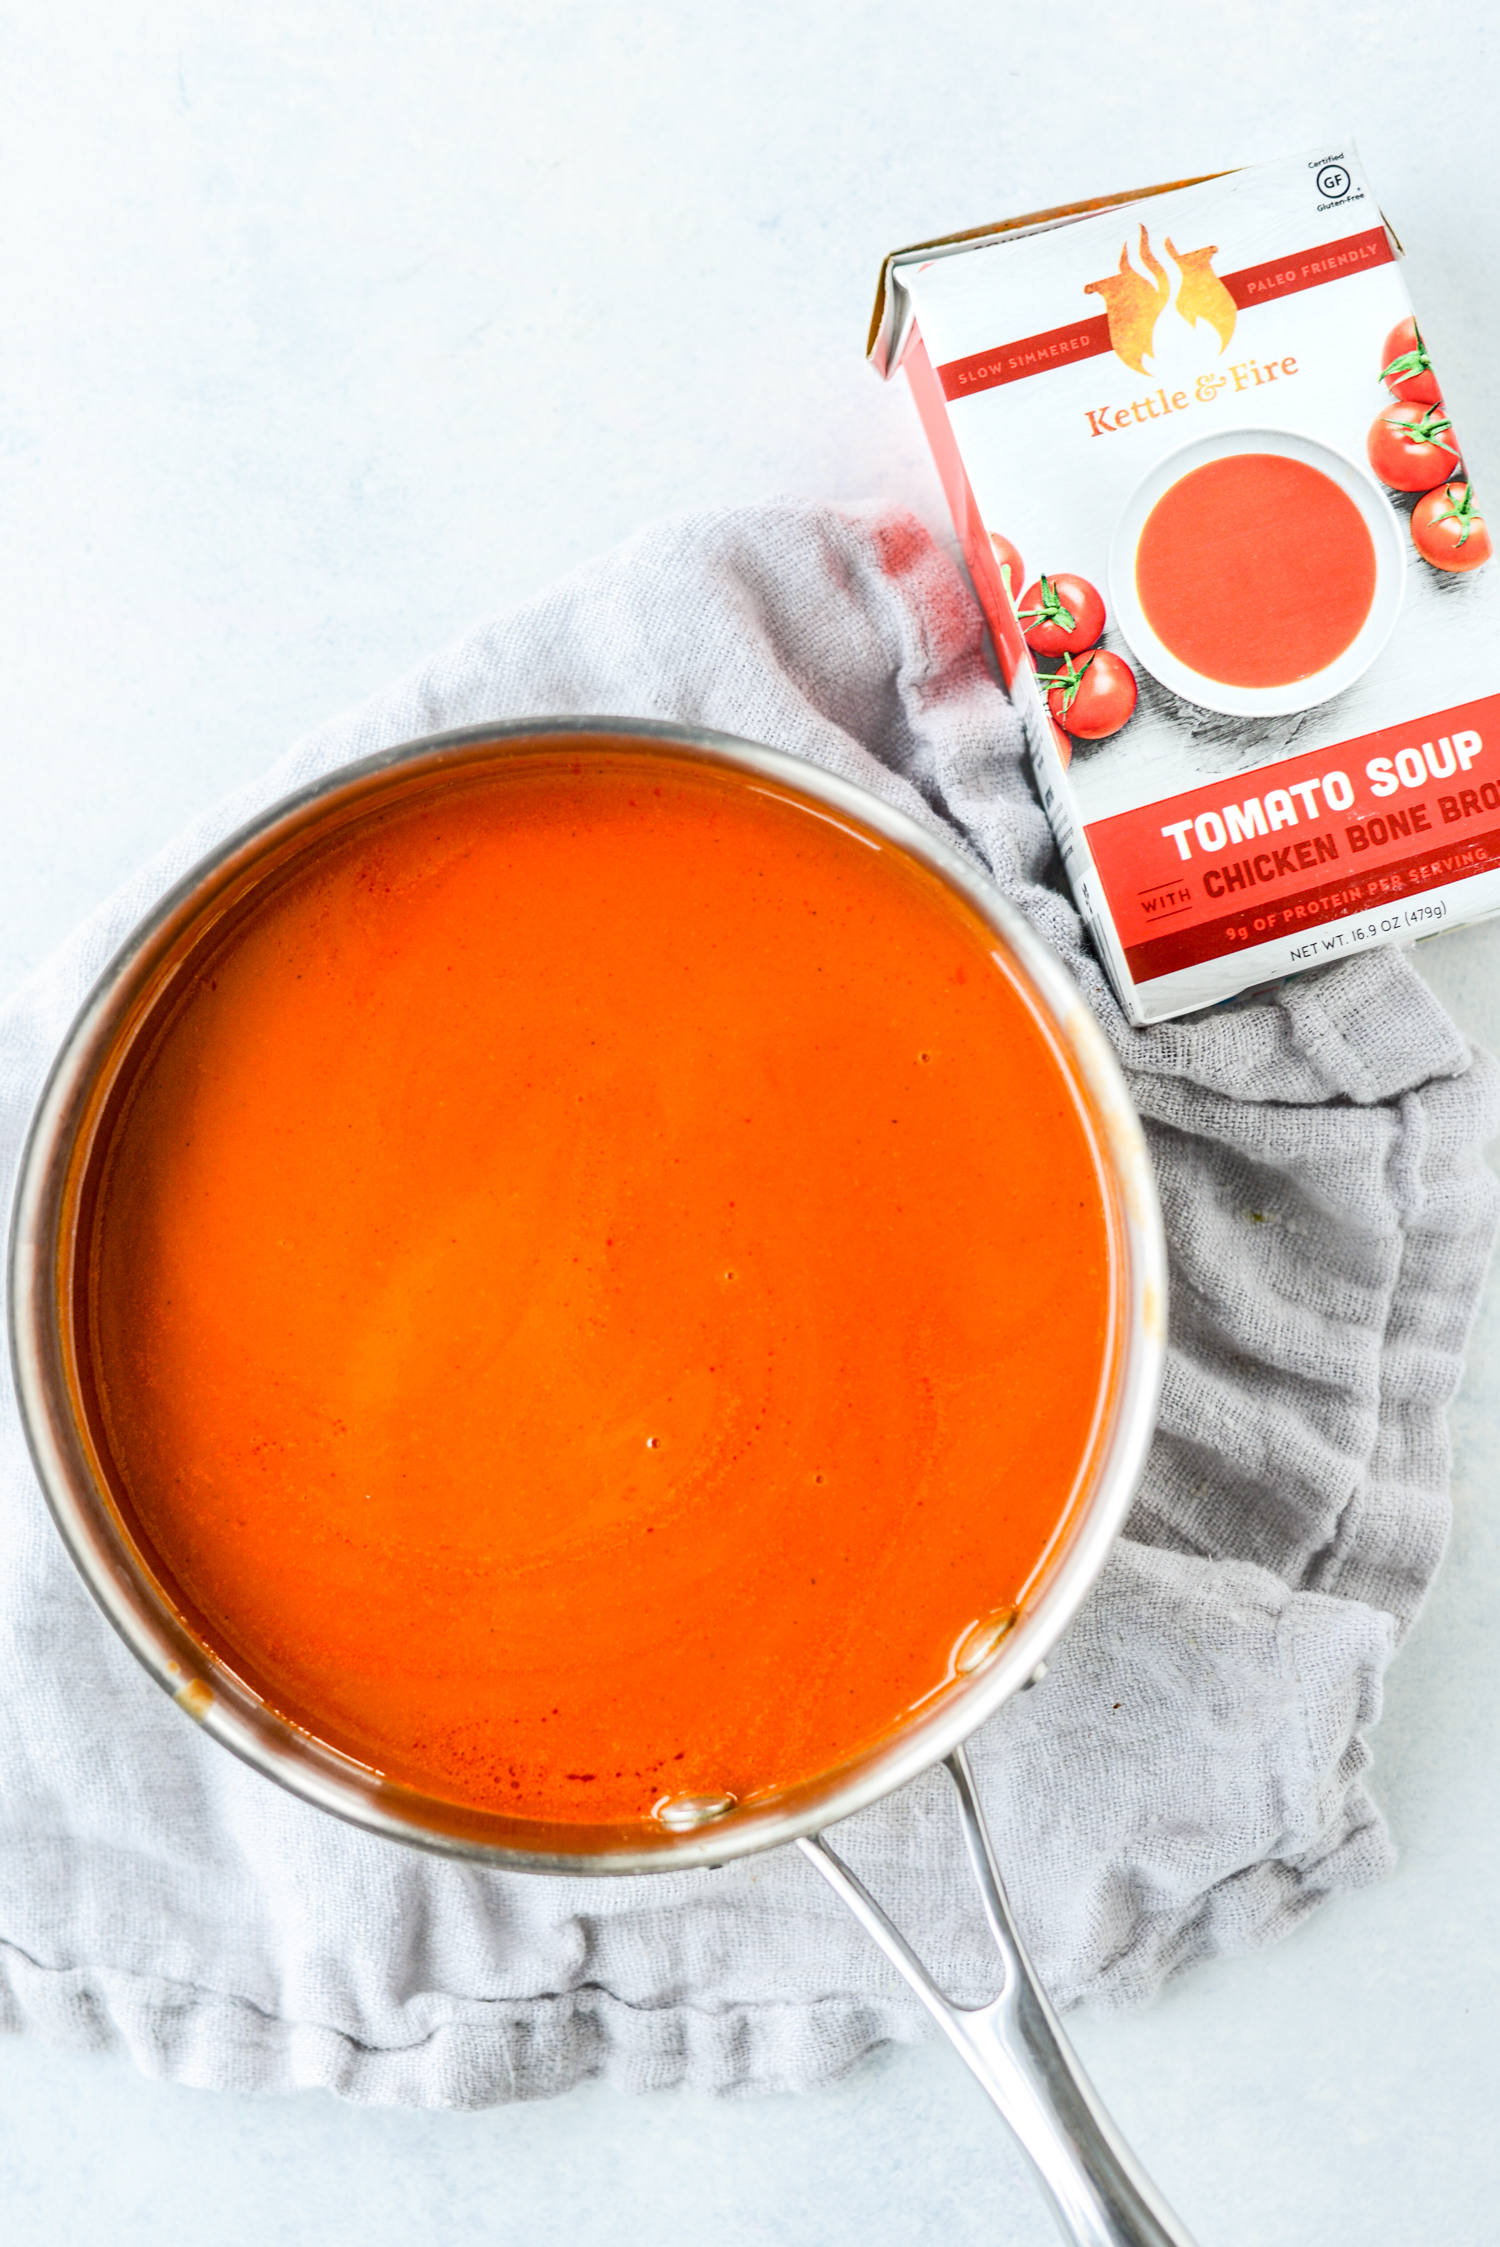 Basic Tomato Soup 5 Ways | simplerootswellness.com #soup #bonebroth #healthyrecipe #quickandeasy